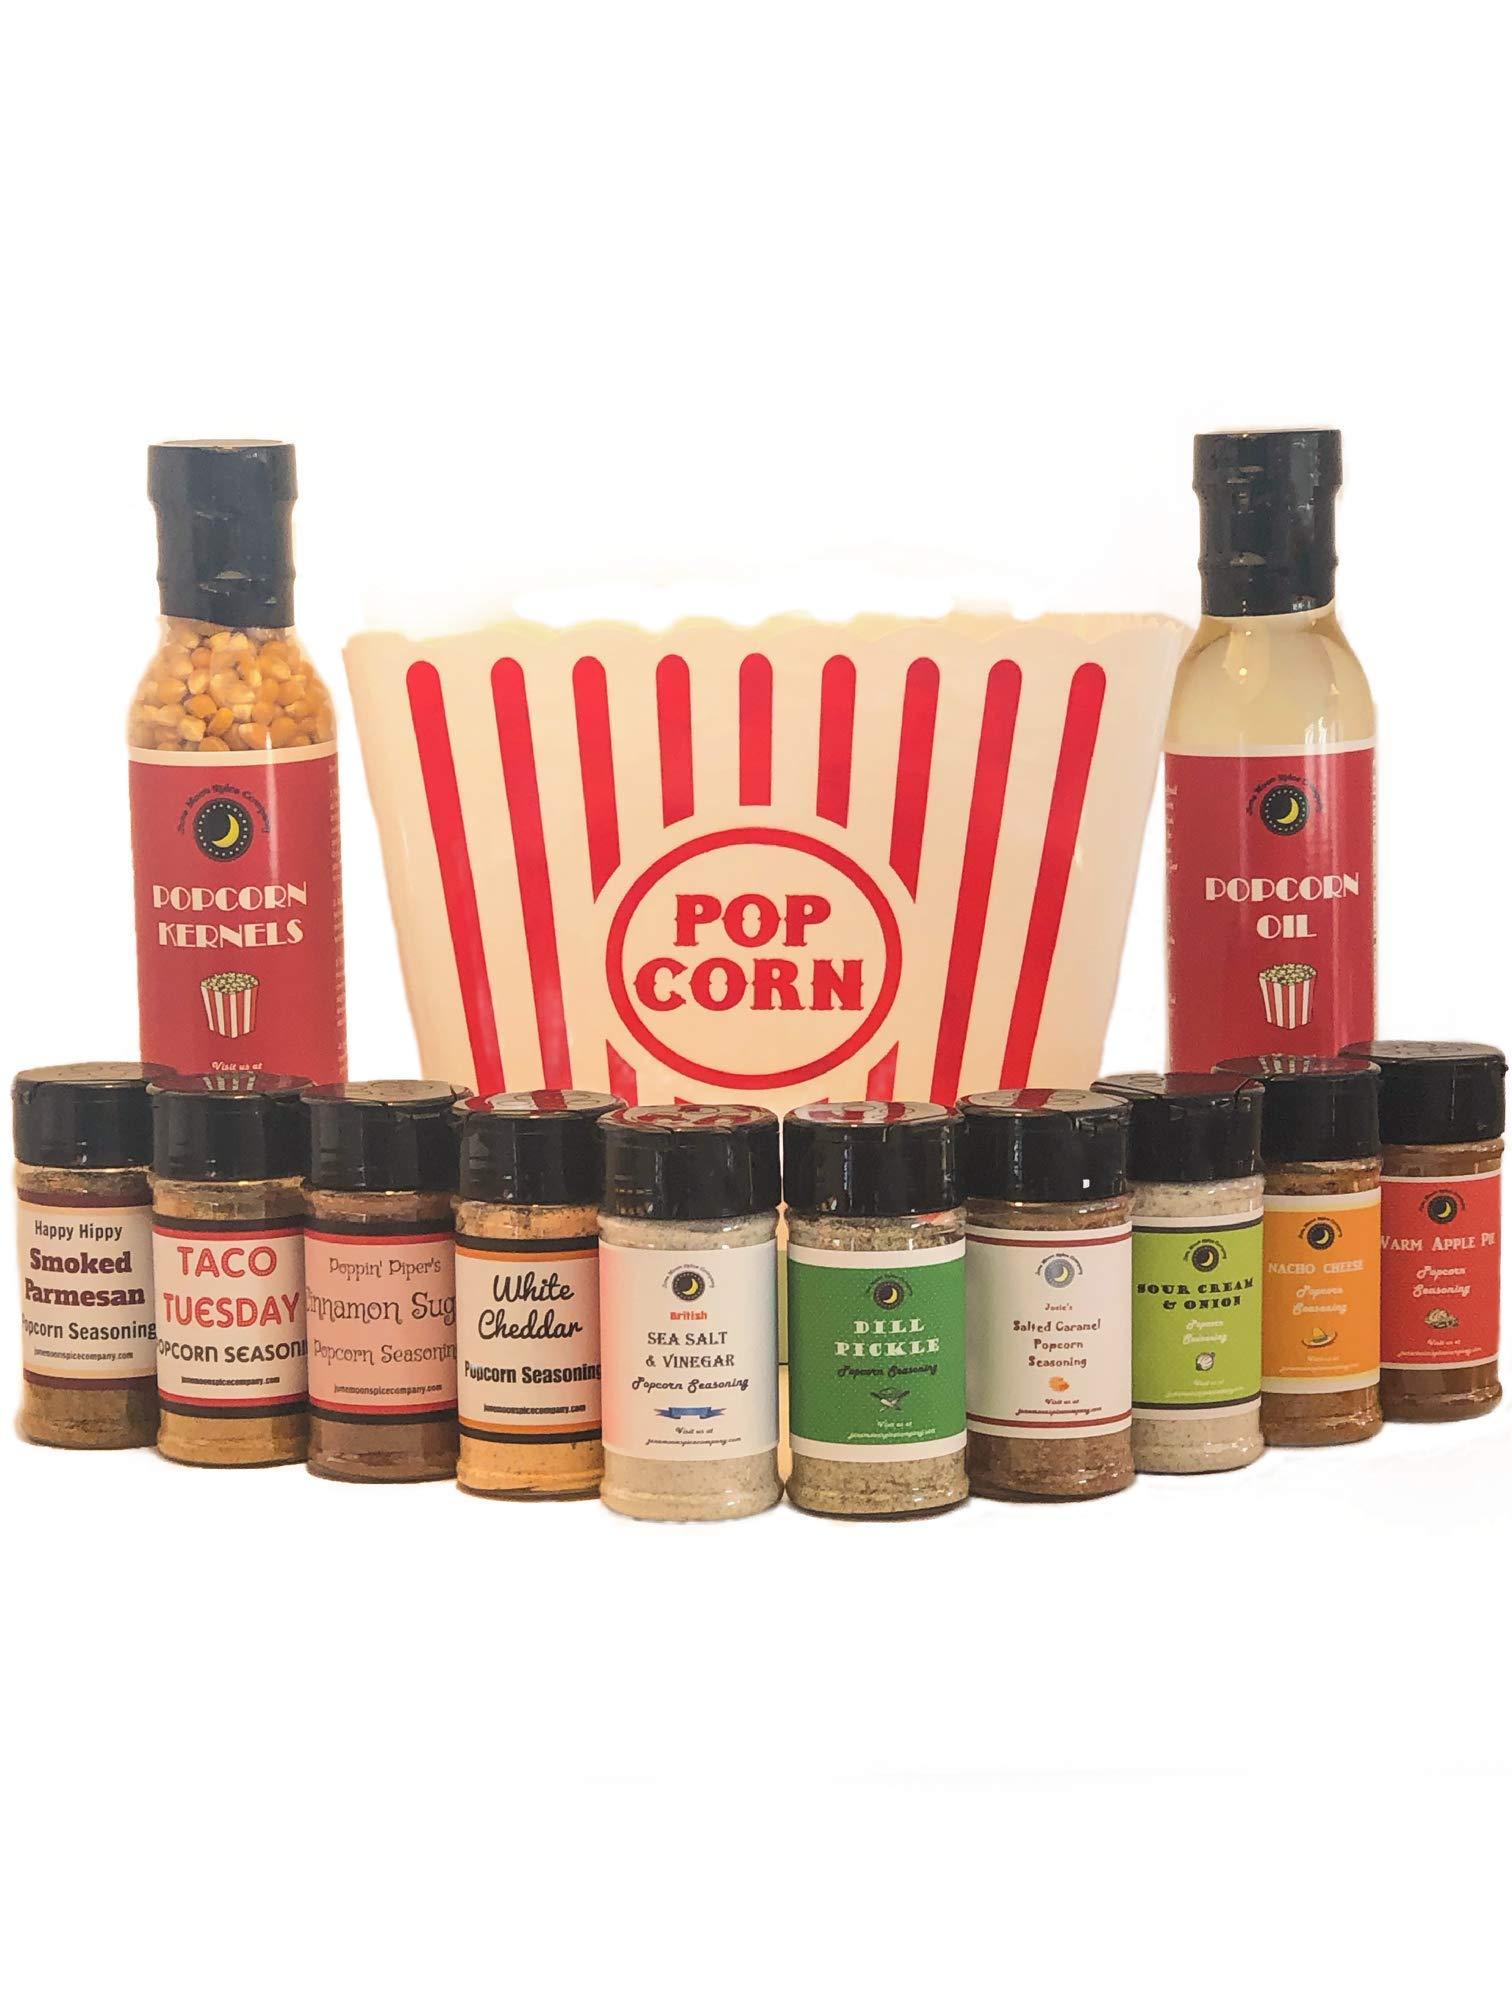 Popcorn Party | BEST SELLING POPCORN SEASONING Variety 10 Pack | Saled Caramel | White Cheddar | Taco | Apple Pie | Nacho Cheese | Sea Salt & Vinegar | Cinnamon Sugar | Dill Pickle | etc.